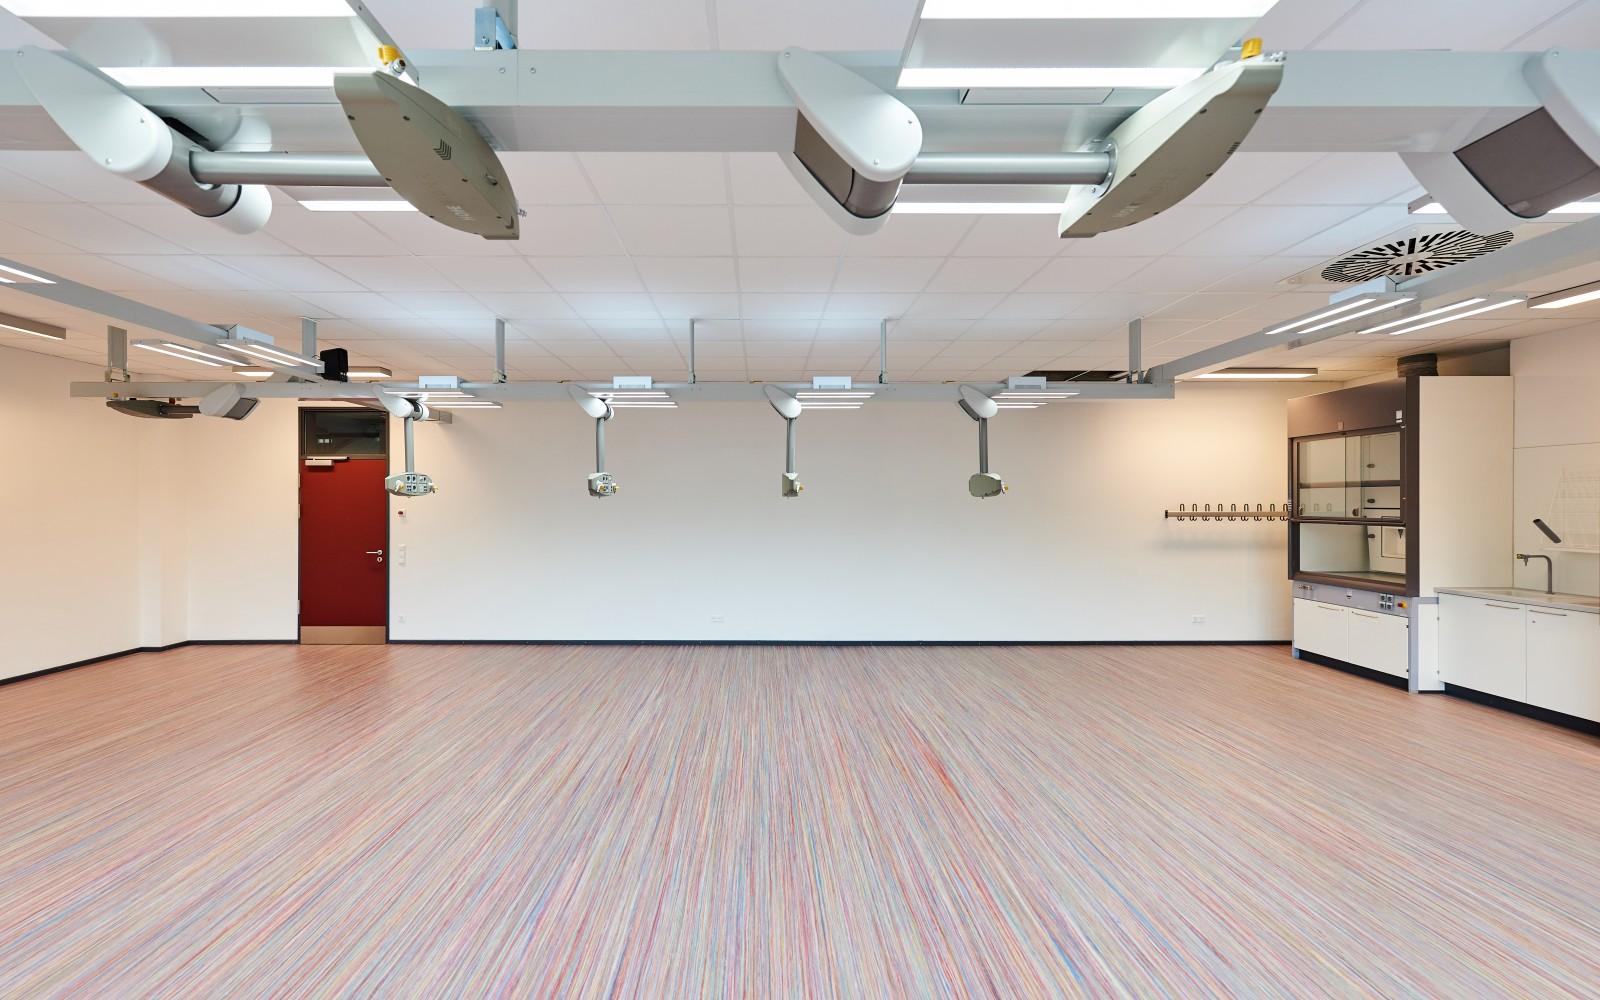 neubau-gymnasium-hochrad-klassenraum